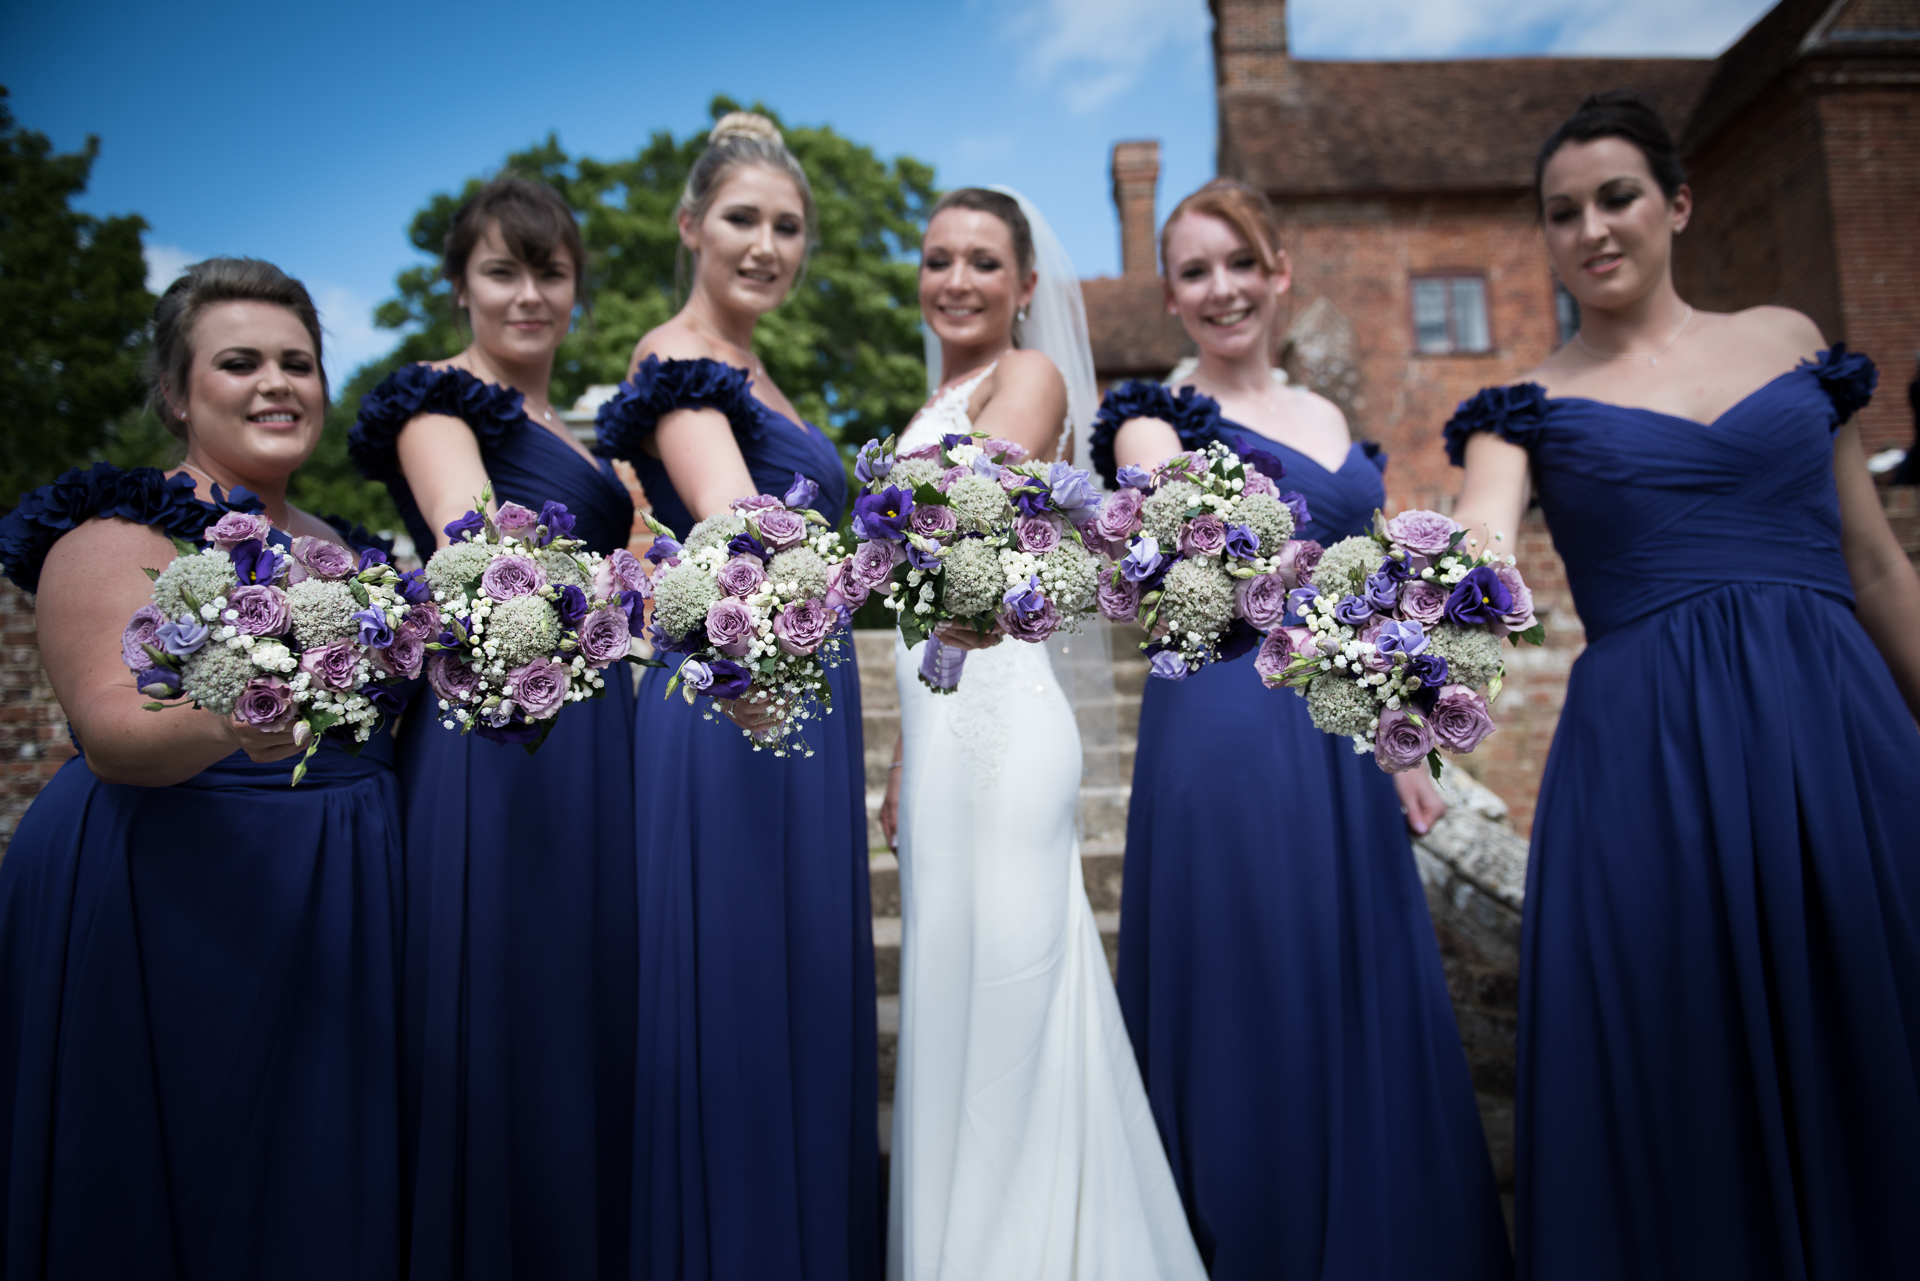 Ufton Court Wedding Photography17.JPG